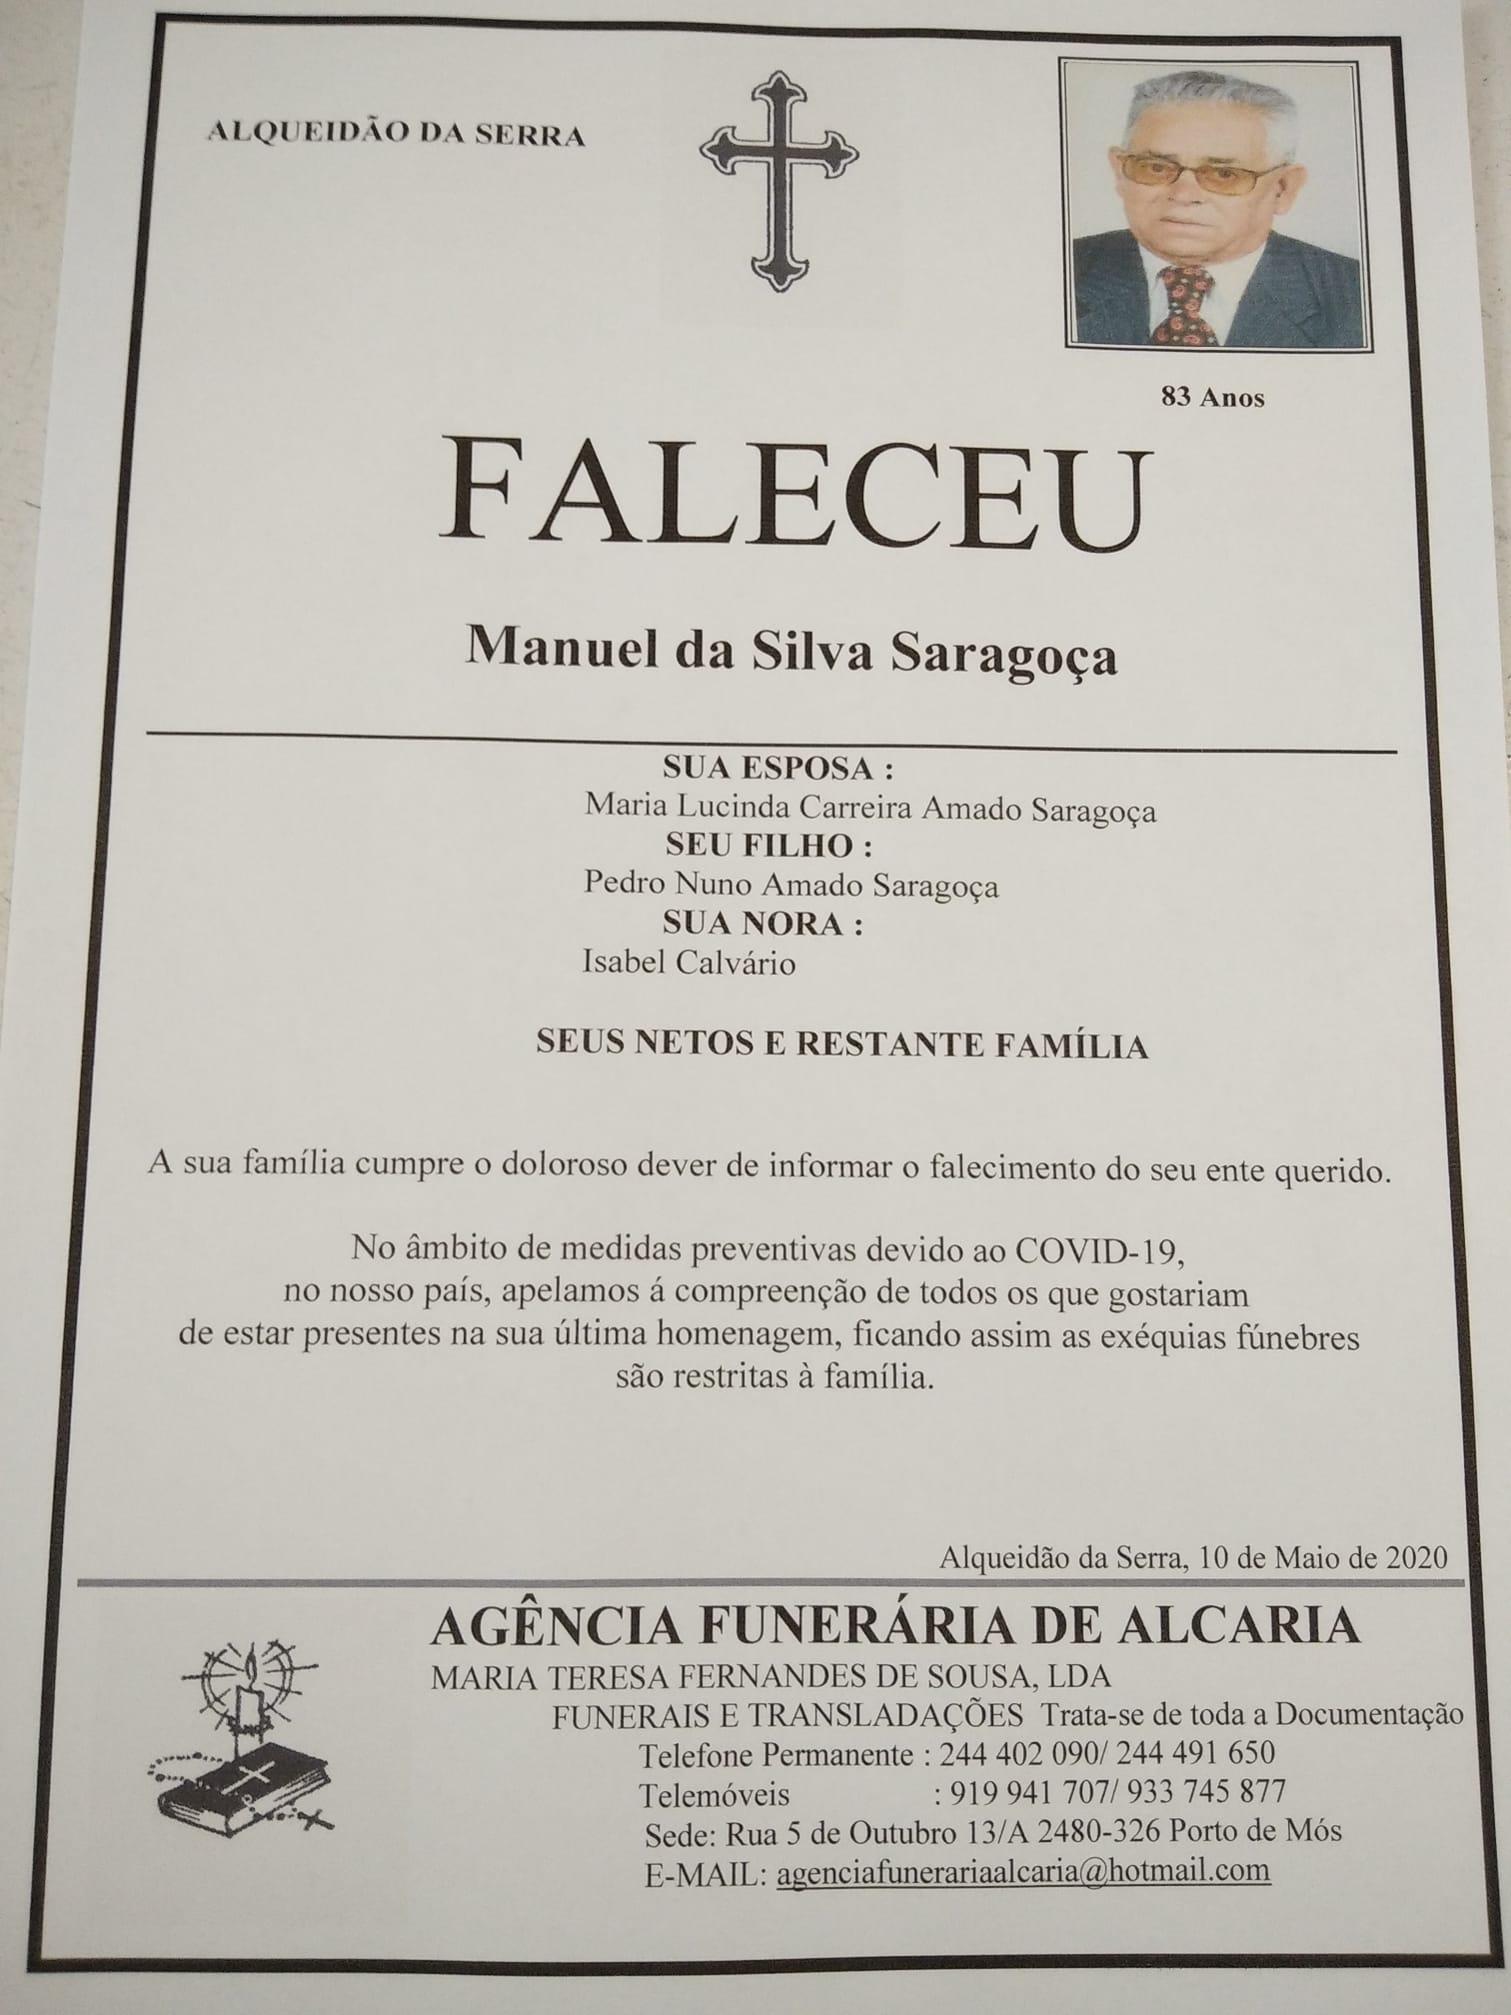 Manuel da Silva Saraçoça